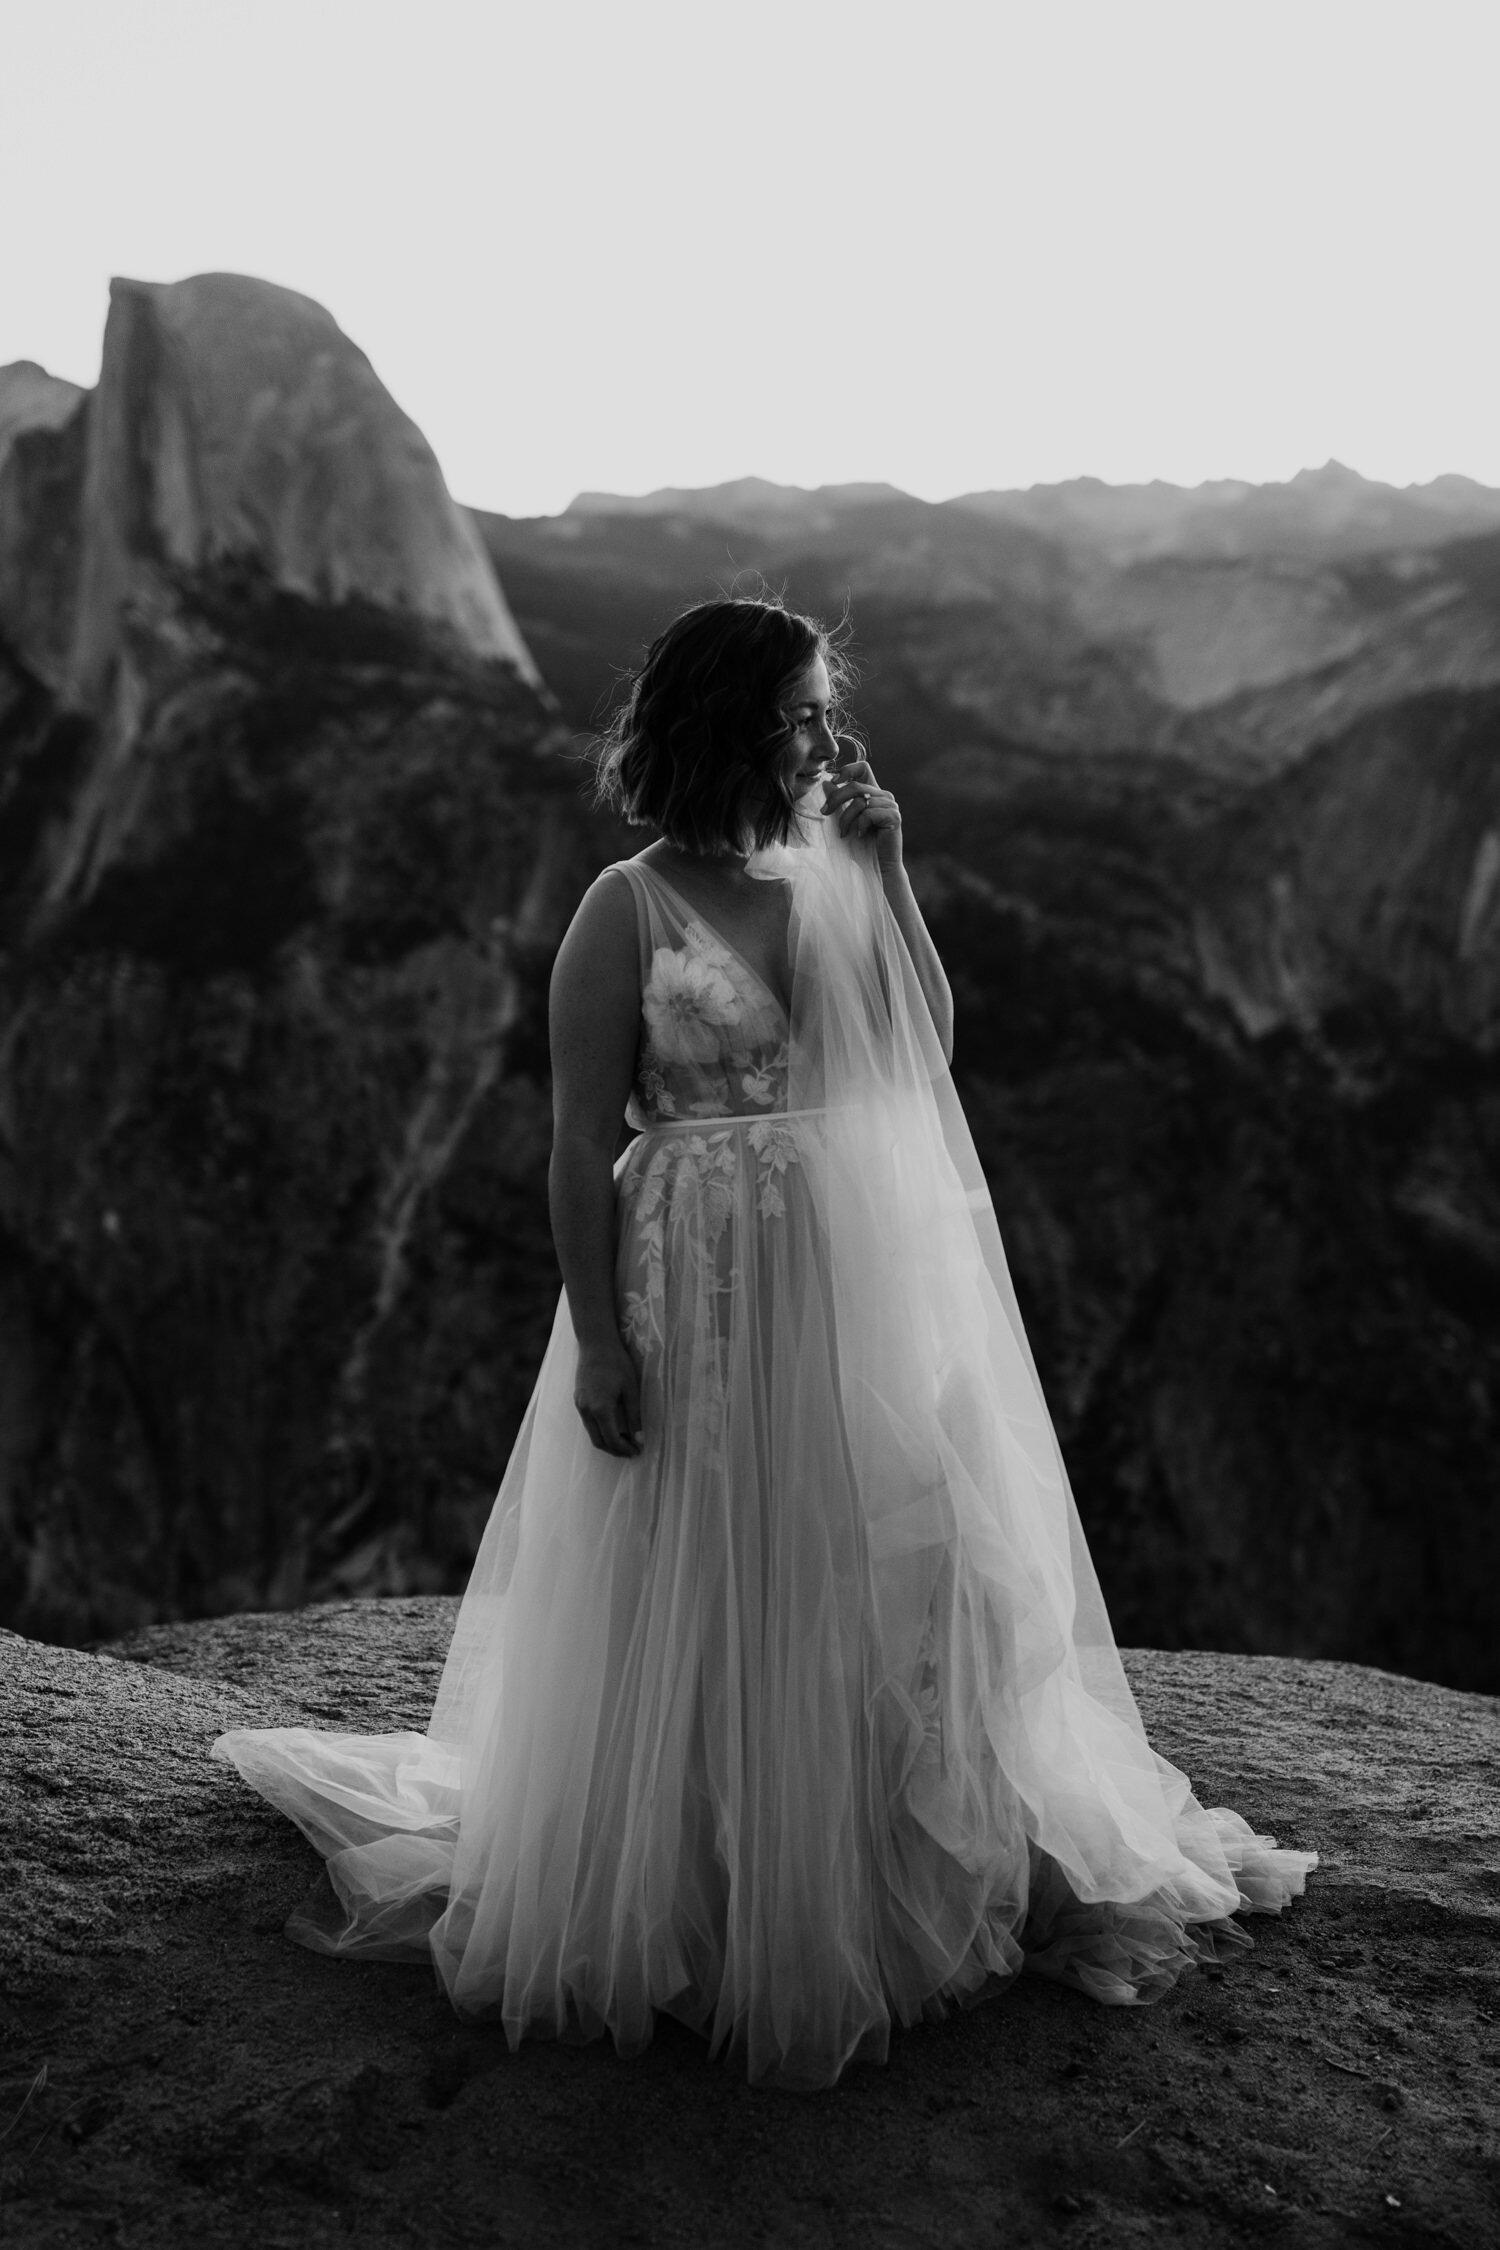 adventure-wedding-yosemite-national-park-6.jpg